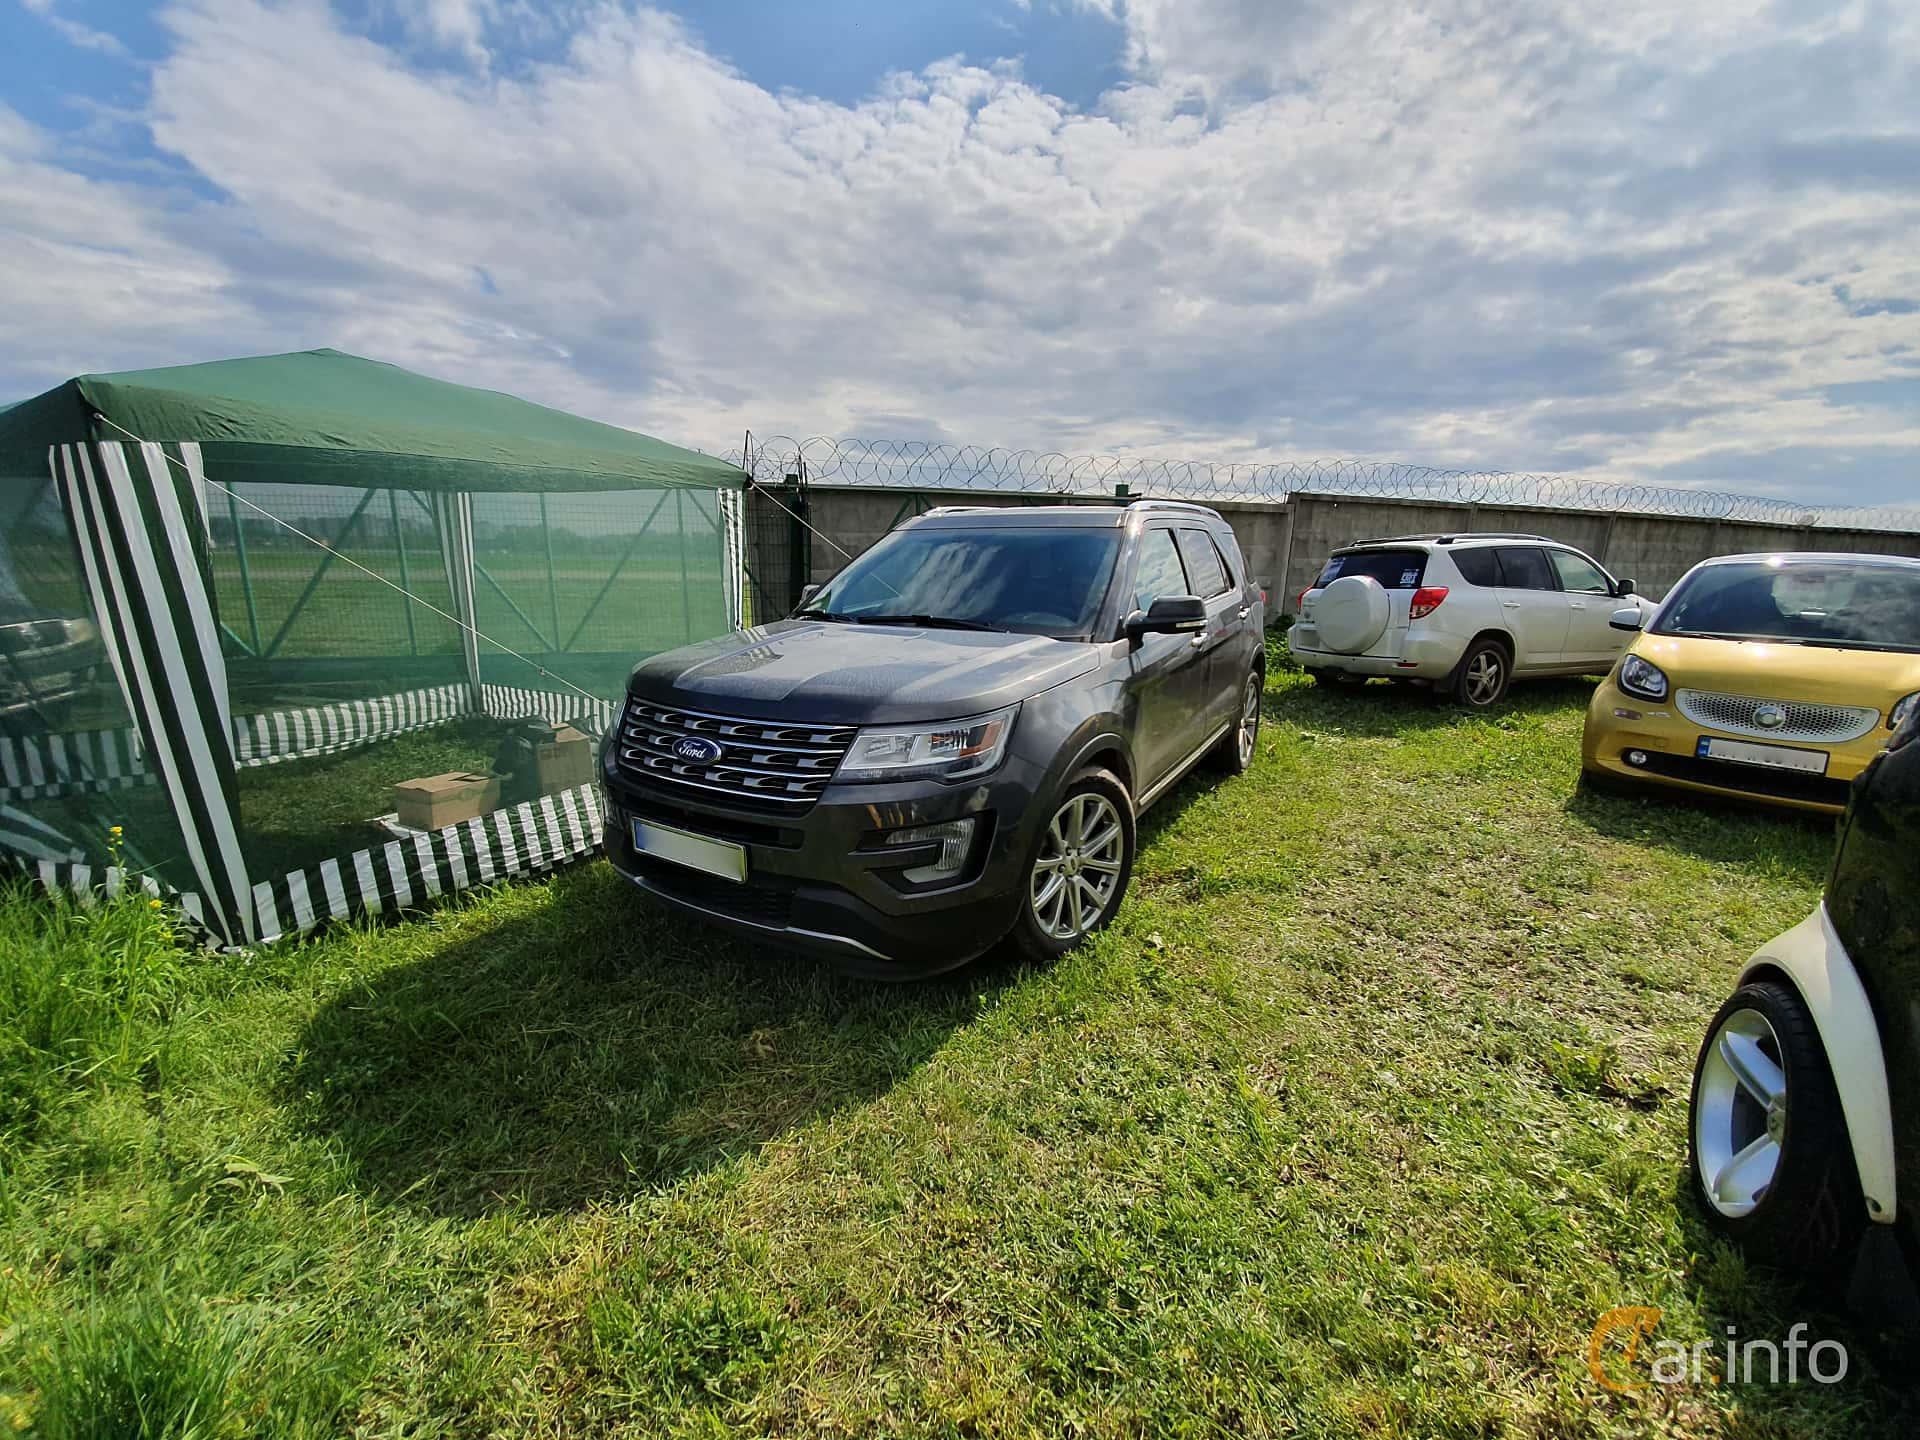 Ford Explorer 2.3 EcoBoost 4WD SelectShift, 284hp, 2017 at Old Car Land no.1 2019